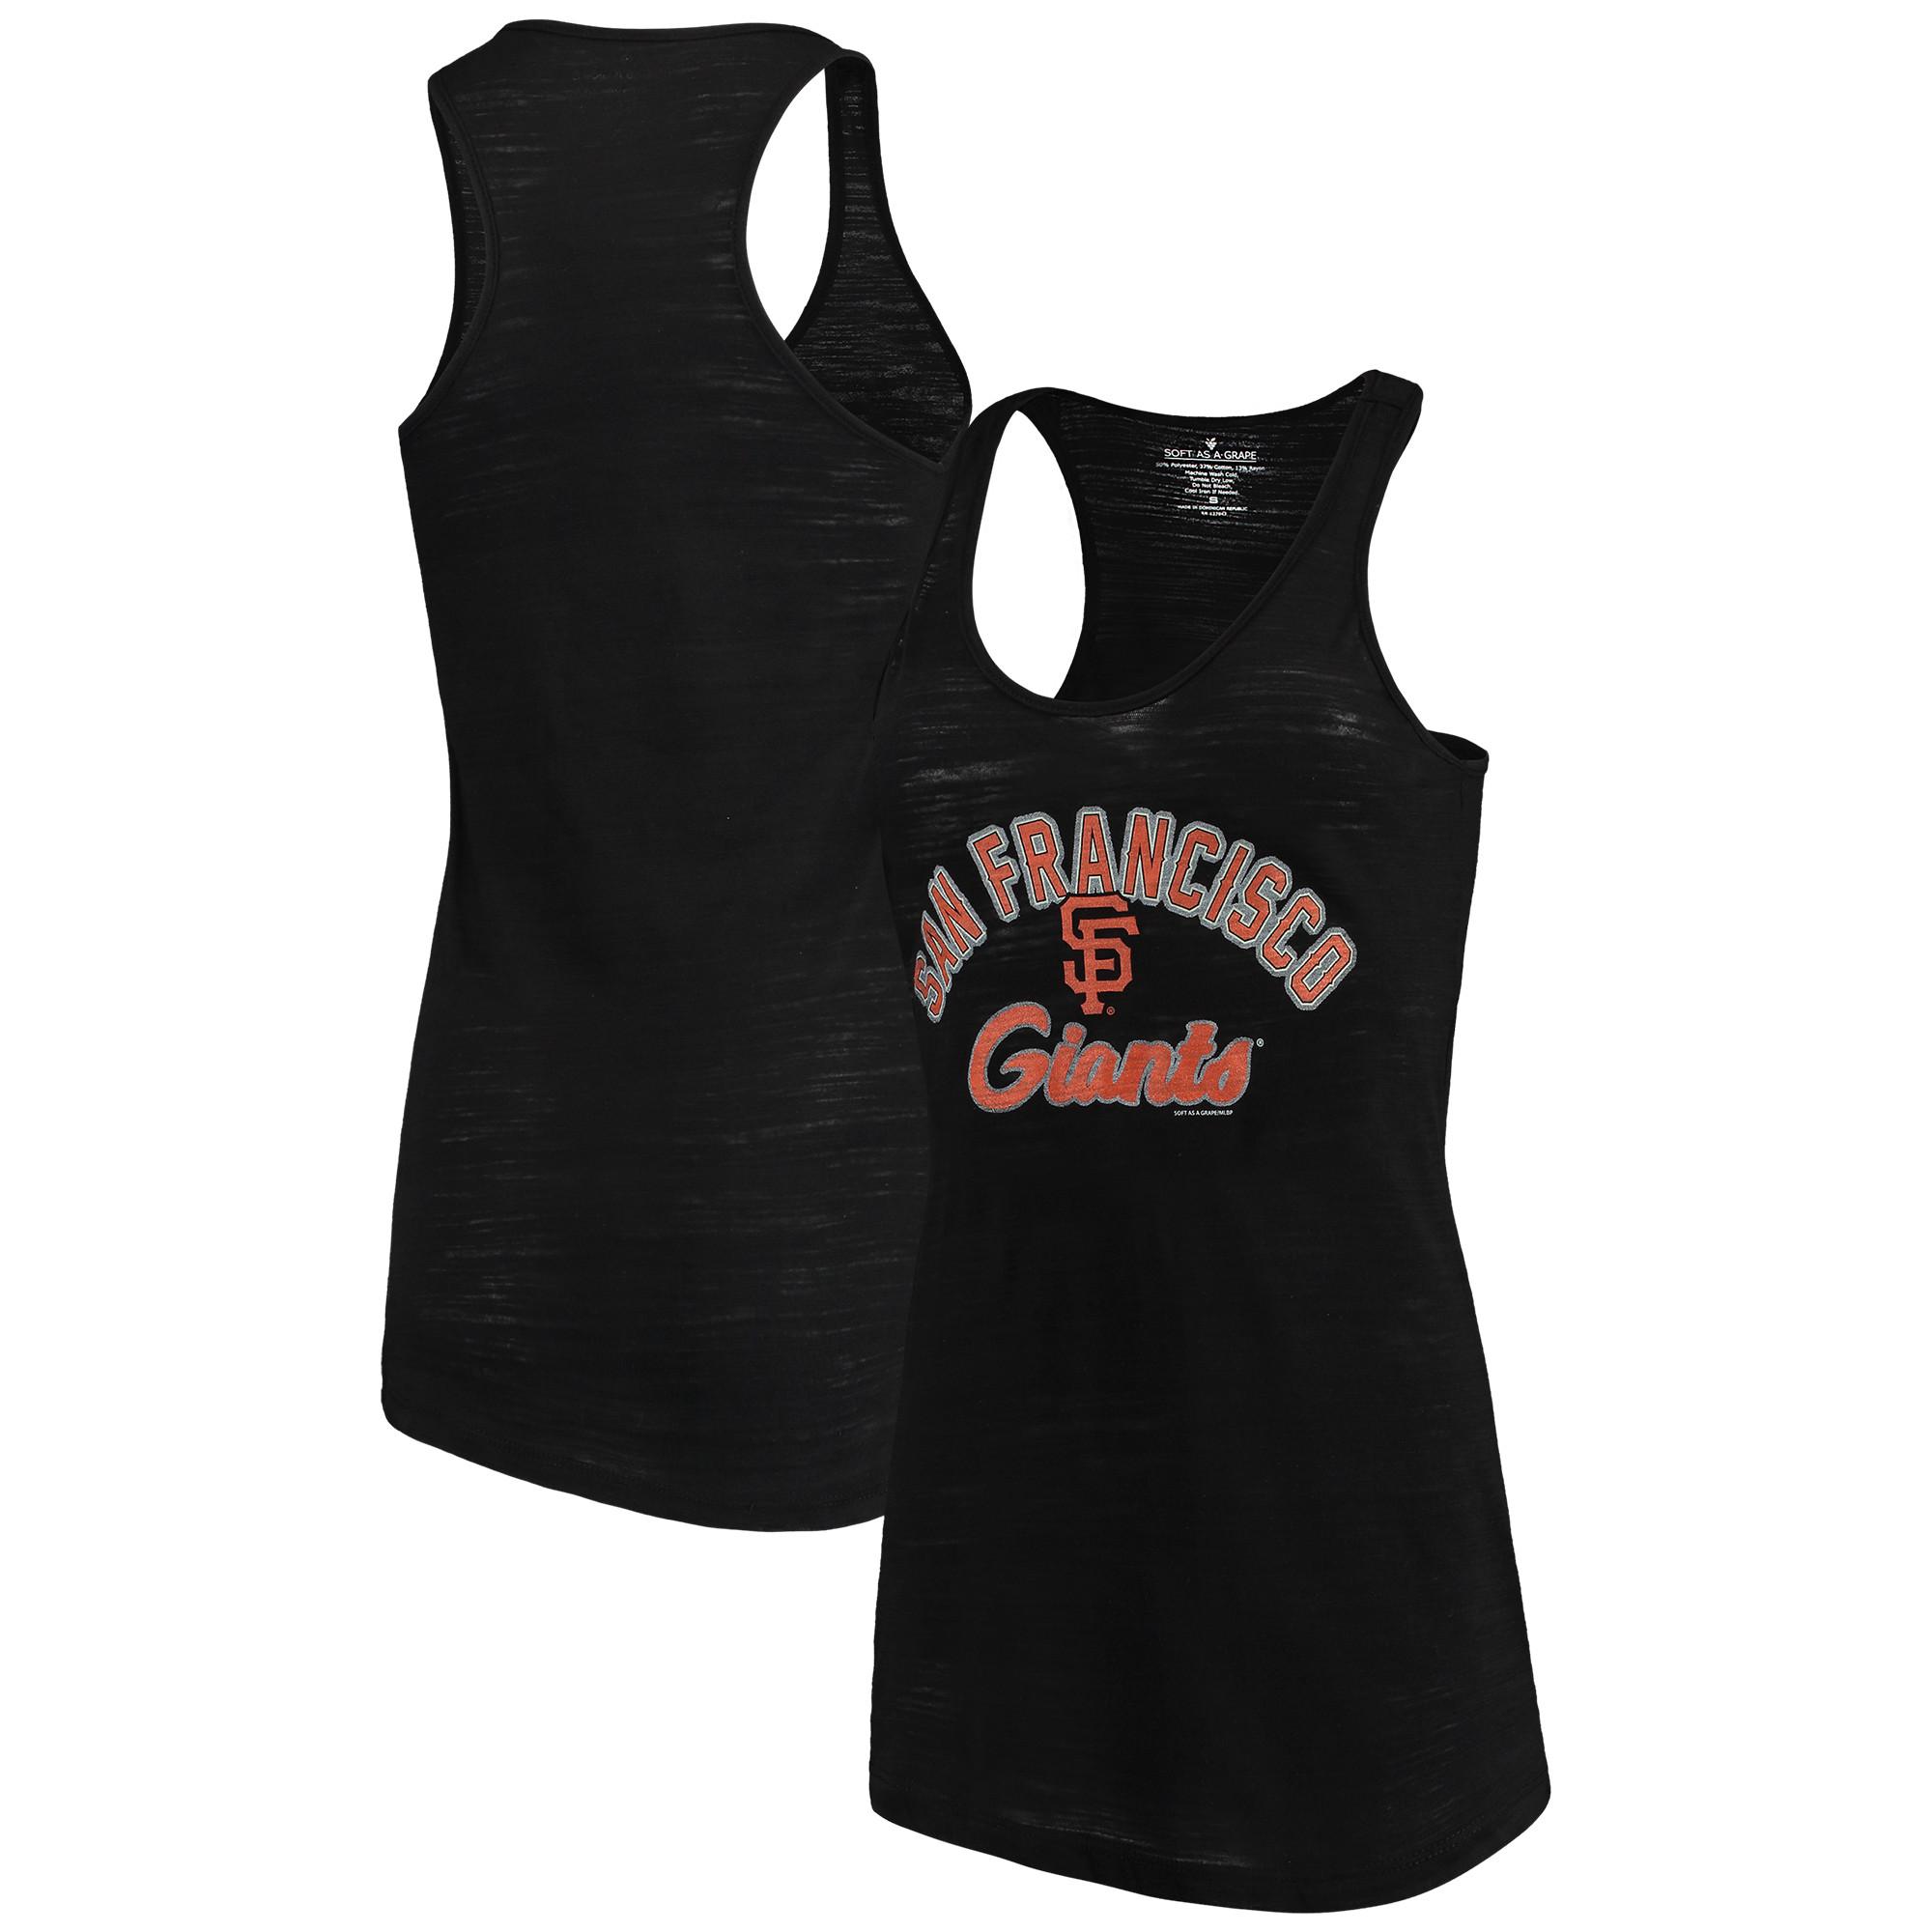 San Francisco Giants Soft as a Grape Women's Multicount Racerback Tank Top - Black